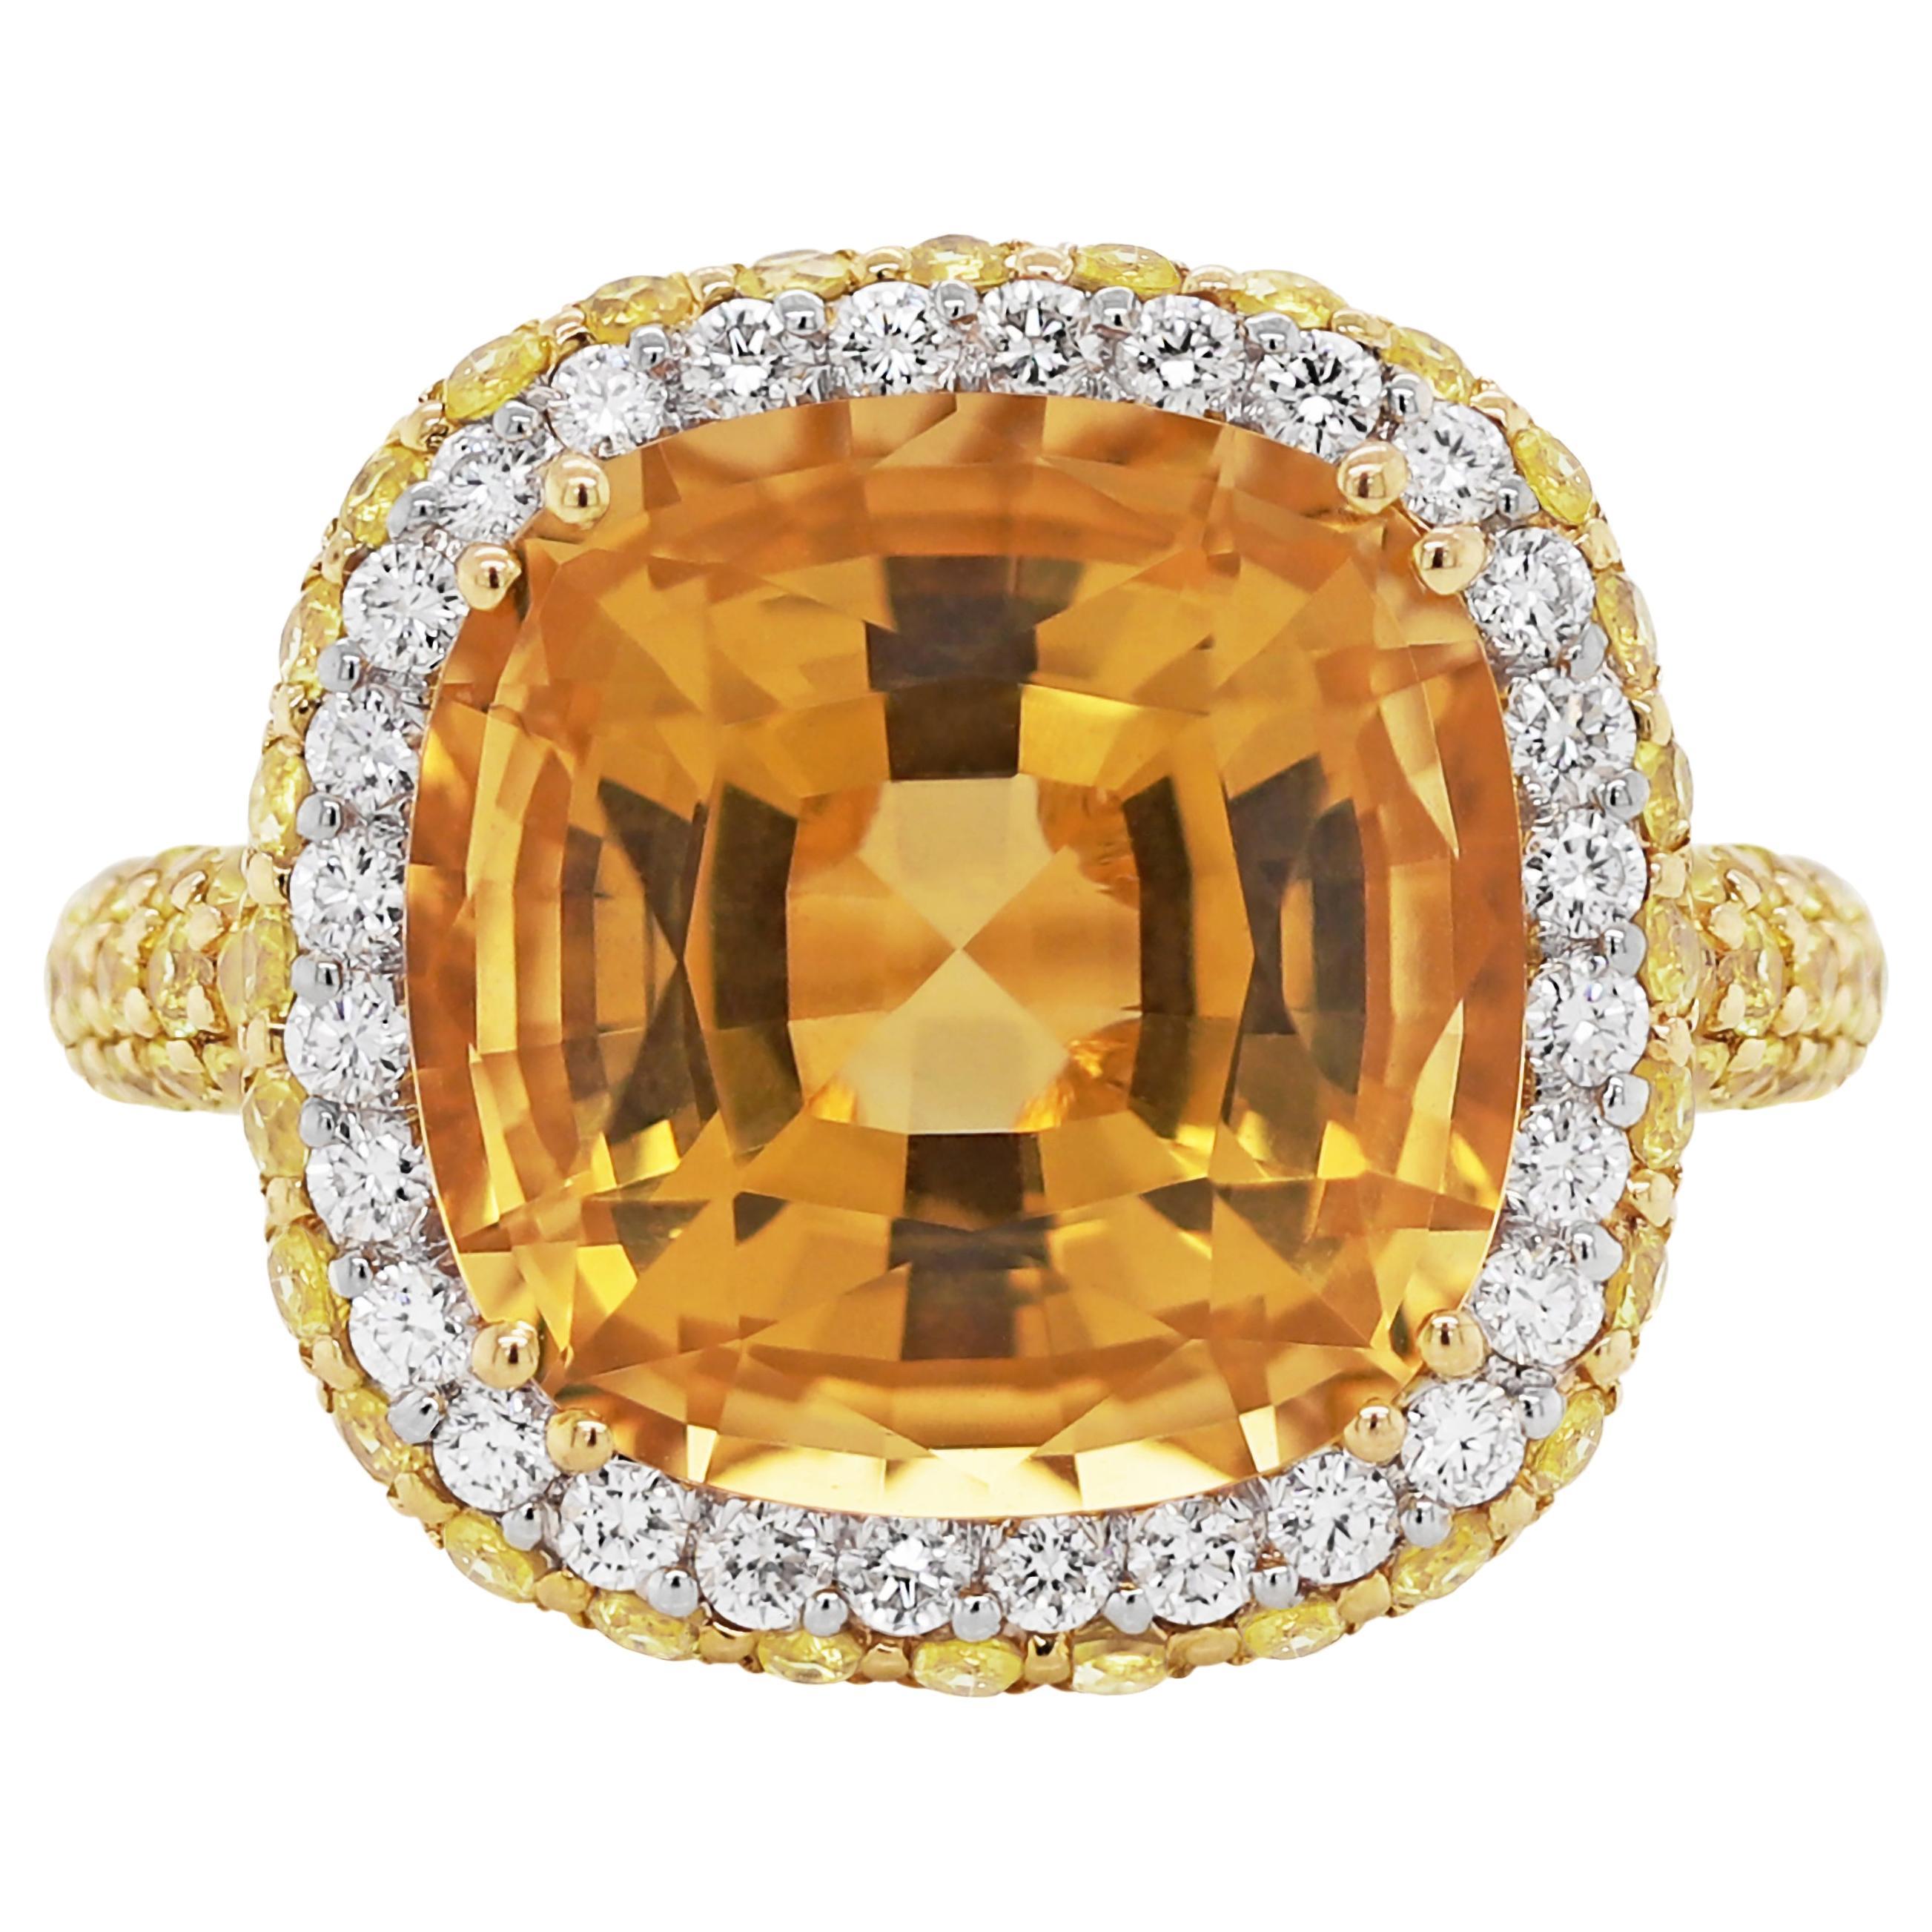 Citrine, Diamond and Yellow Sapphire 18 Carat Gold Ring